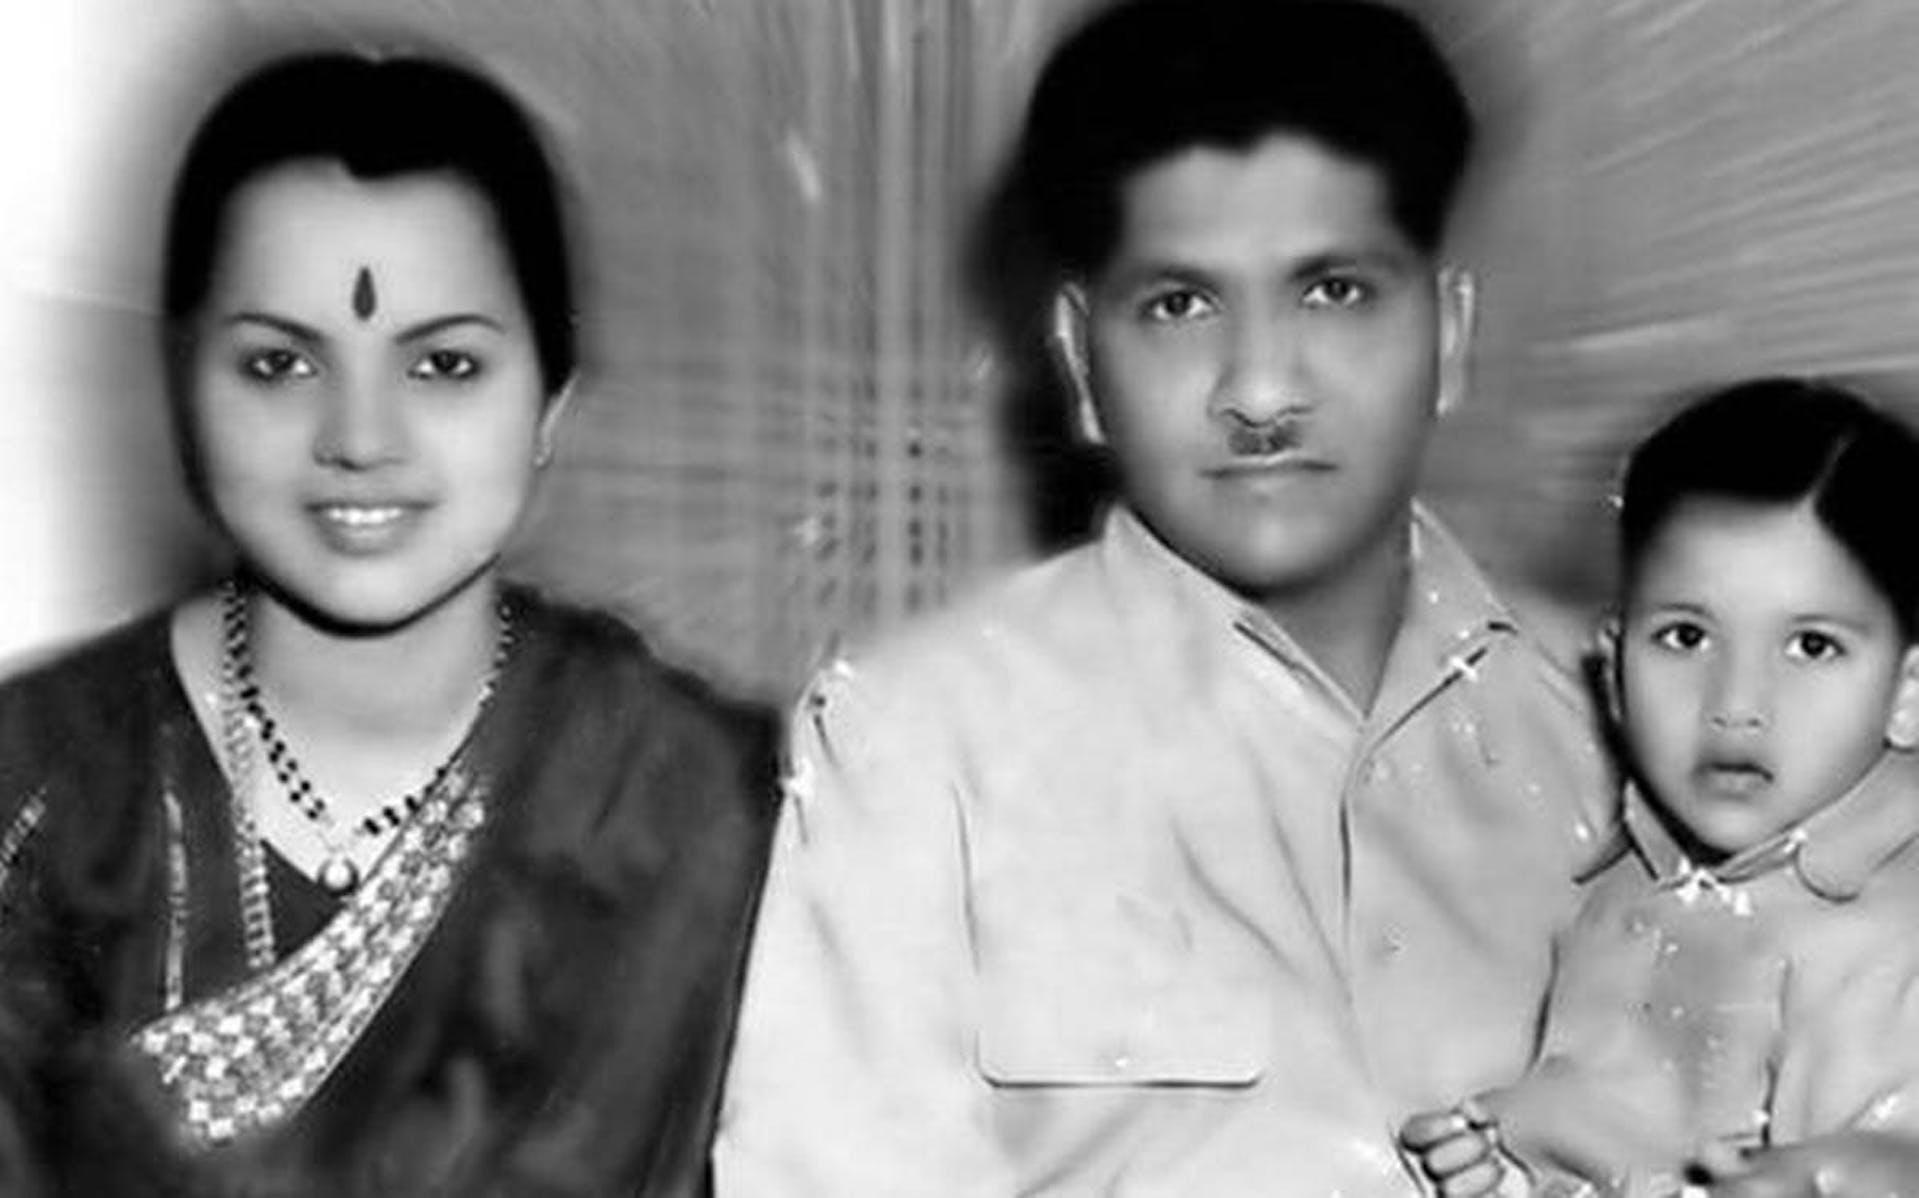 Pratima Devi, Shankar Singh and a young S.V. Rajendra Singh. Photograph by Chari; shot at Woodlands Hotel, Madras